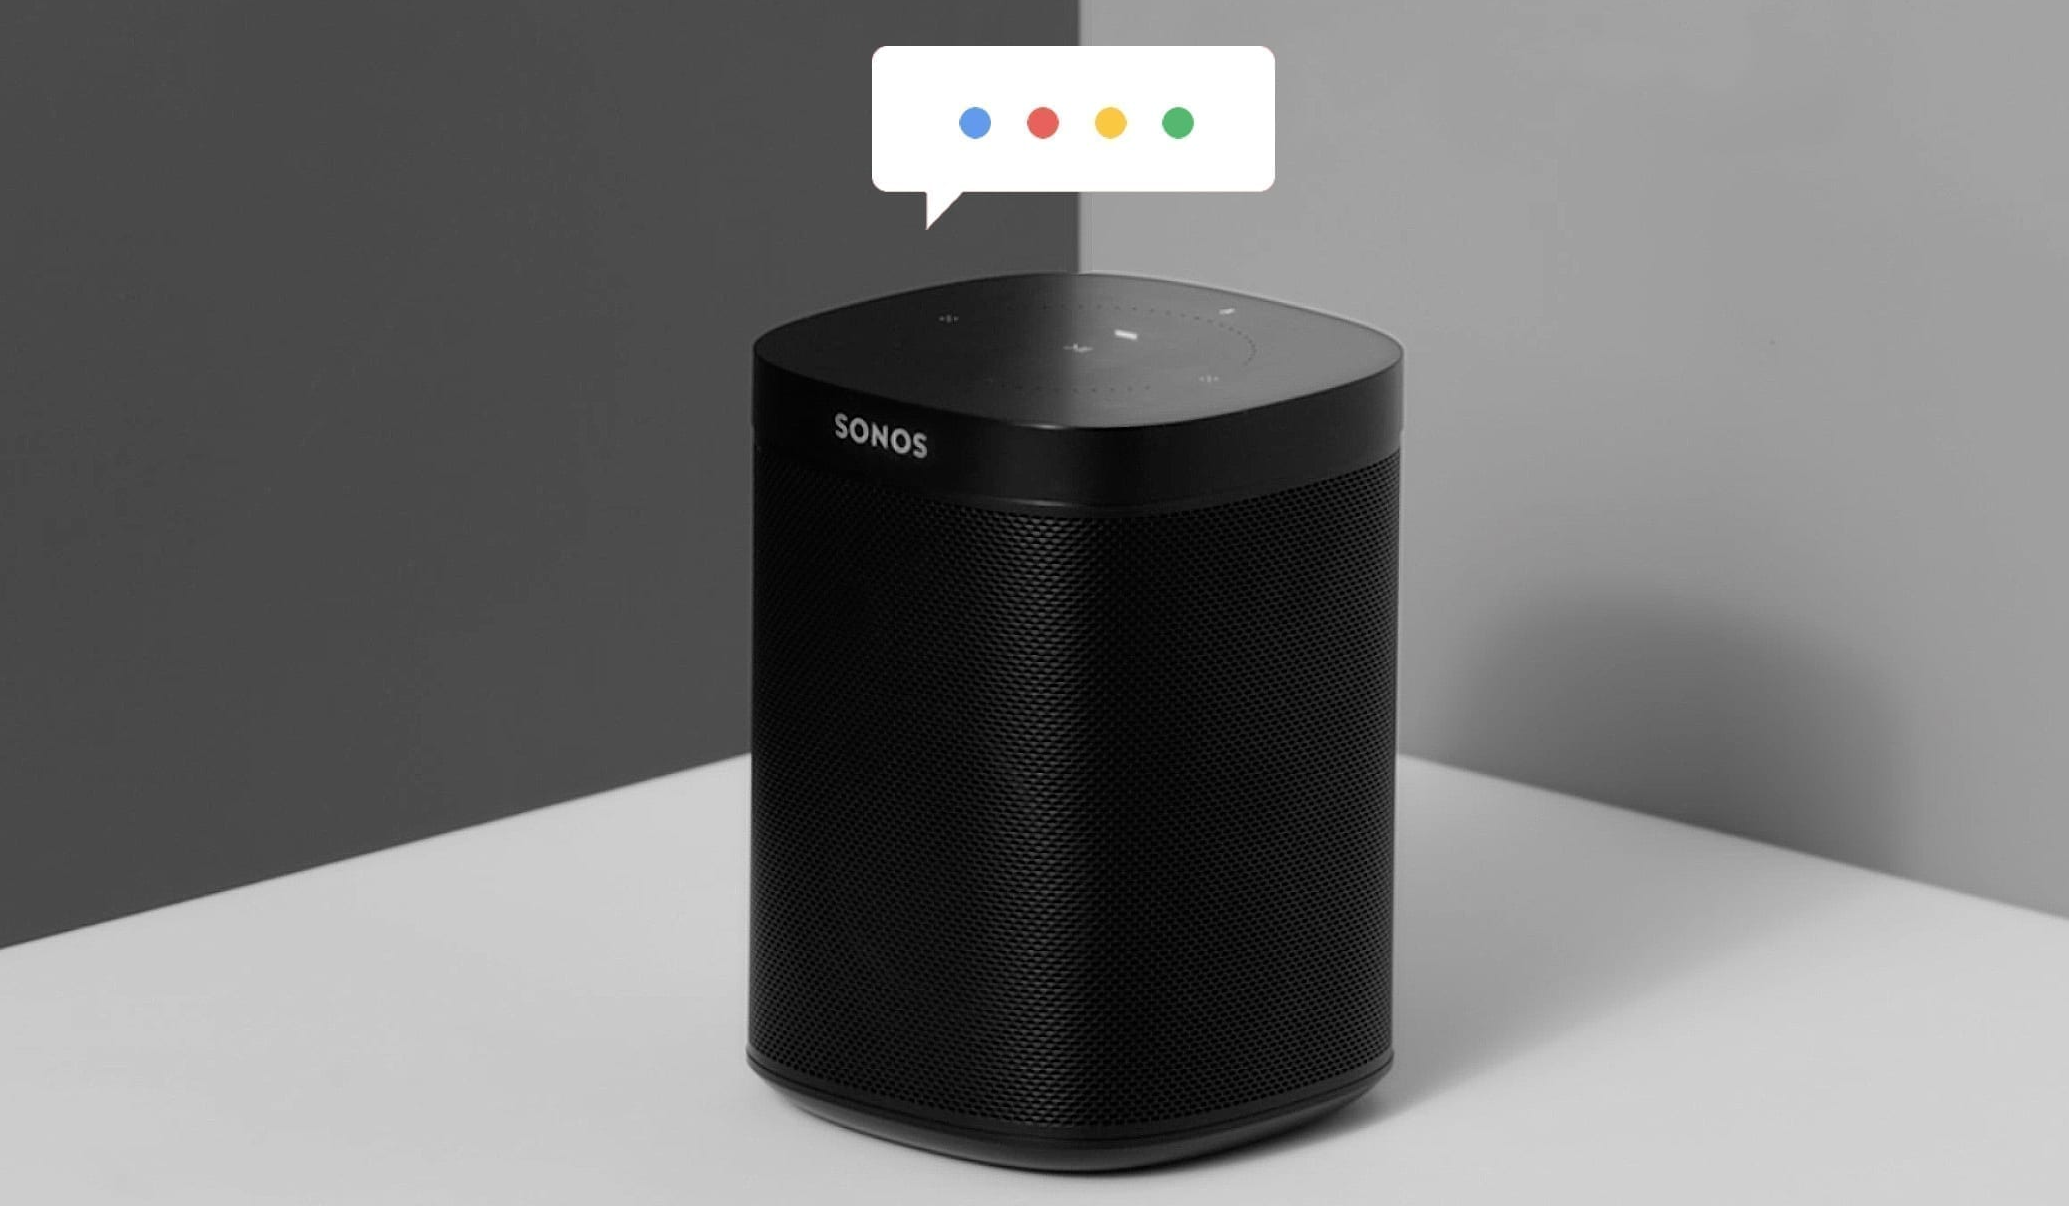 Sonos Google Assistant update